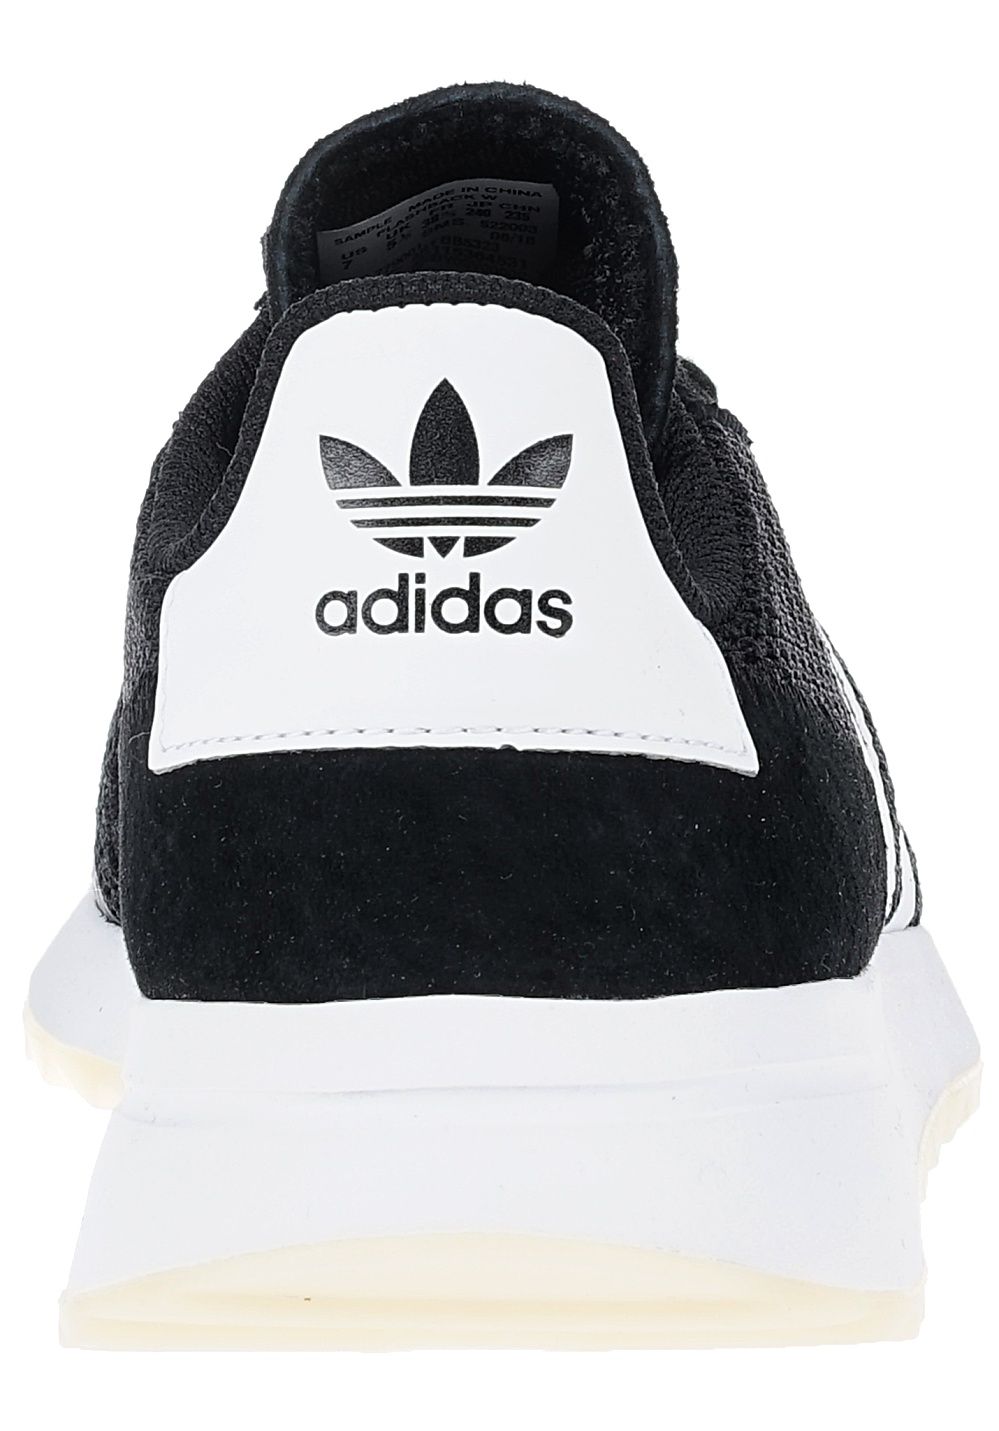 6ad0254623f adidas sneakers Flashback dames zwart/wit - Internet-Sport&Casuals